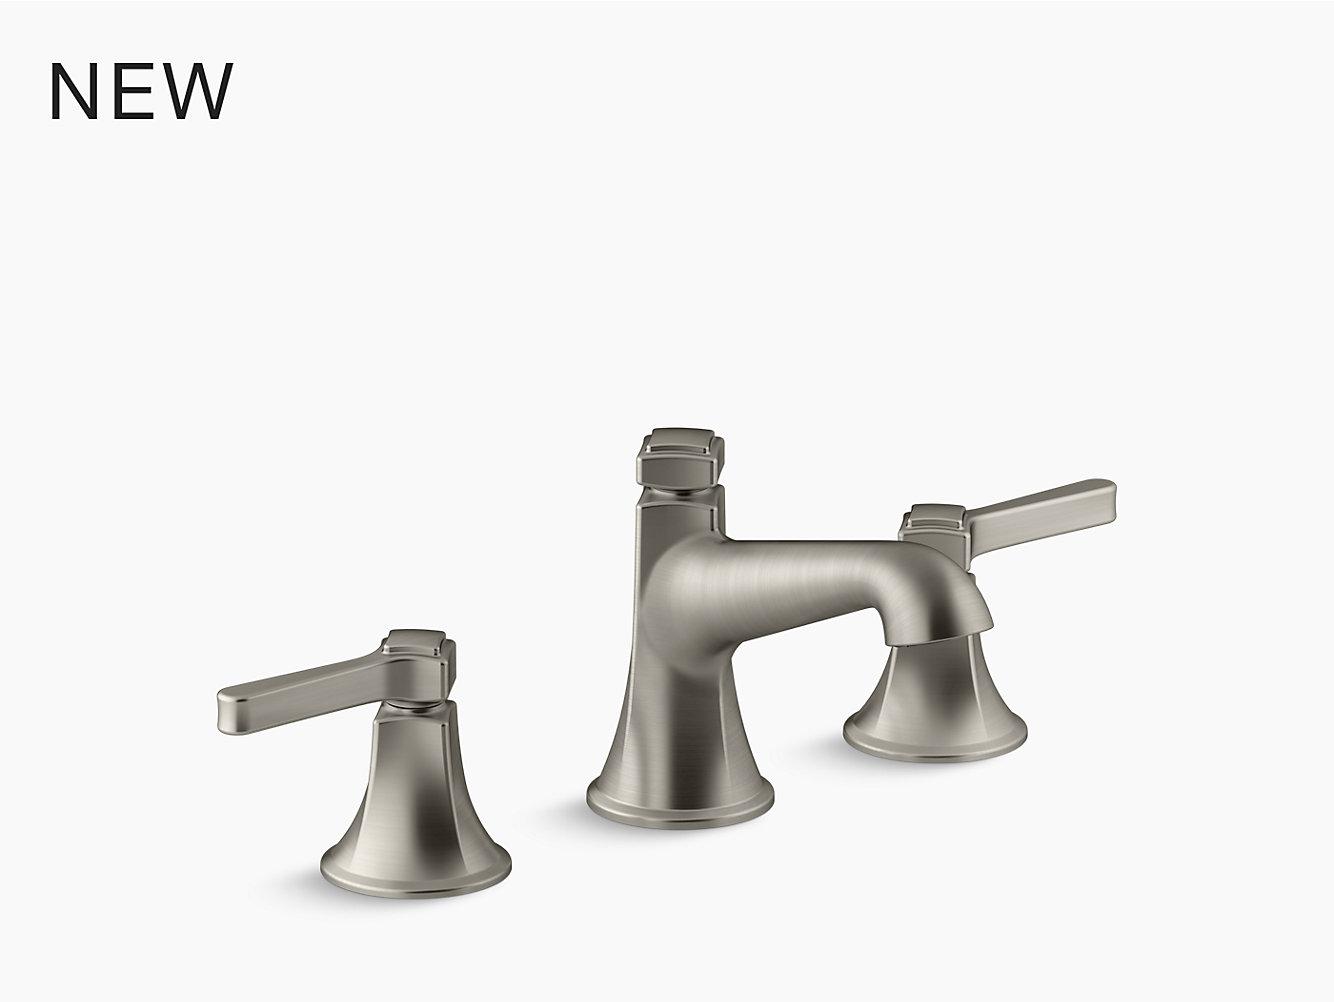 k 560 bellera single handle kitchen sink faucet kohler view larger